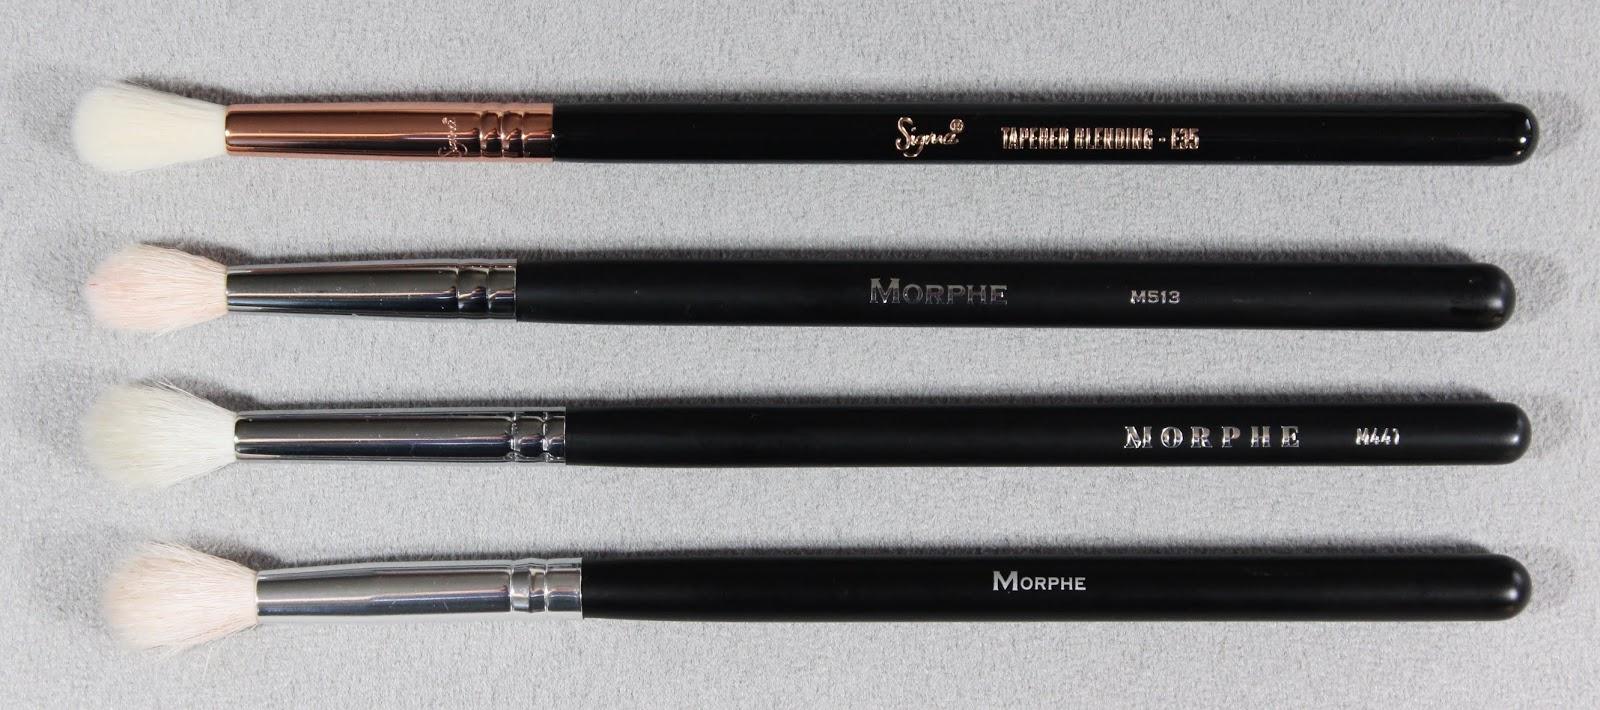 Sigma Brushes Vs Morphe Brushes Dupes The Ra Diaries